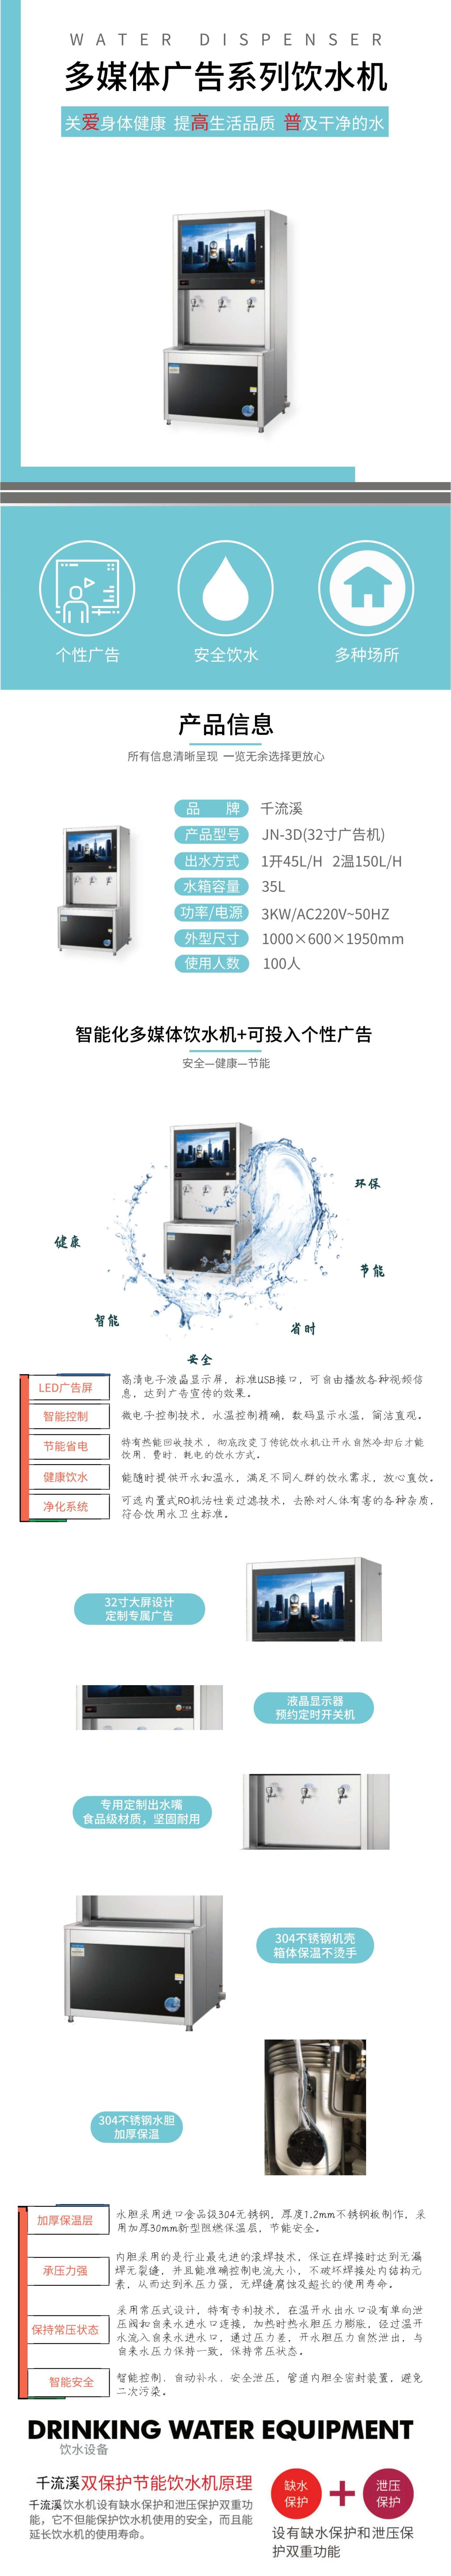 JN-3D(印刷版)_00_01.jpg